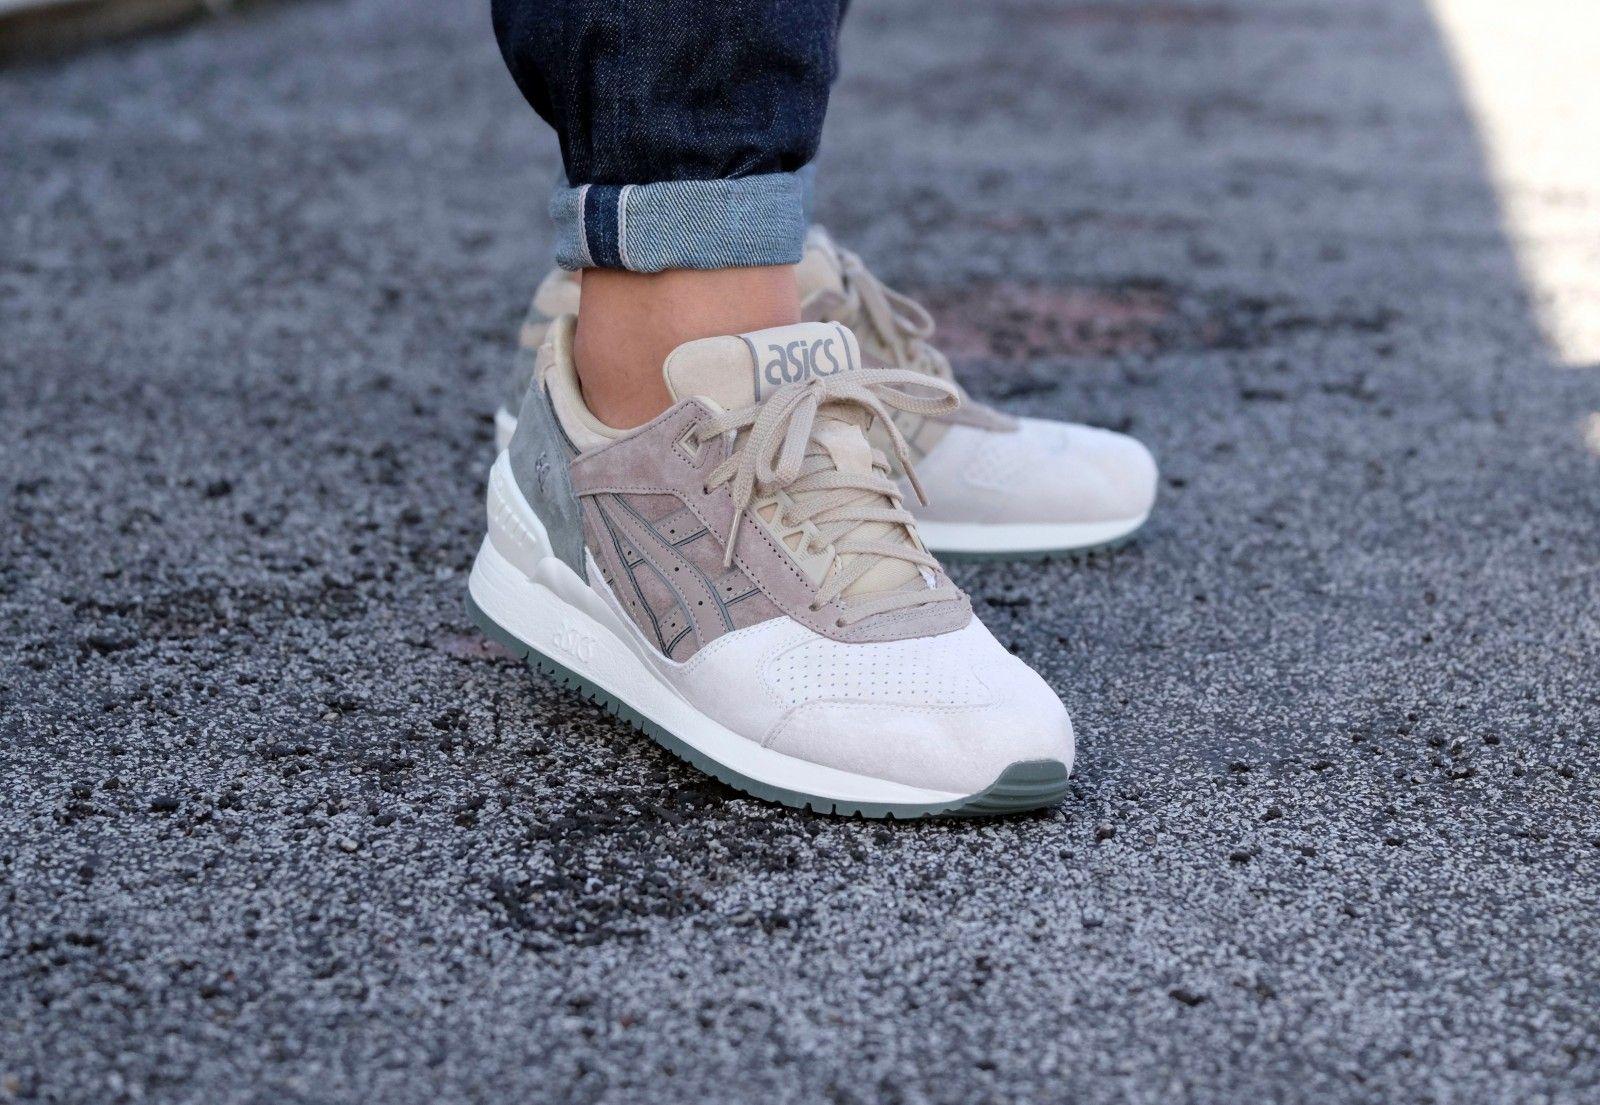 Asics Gel Respector Japanese Garden Pack Taupe Grey H720l 1212 Sneaker Taupe Schoenen